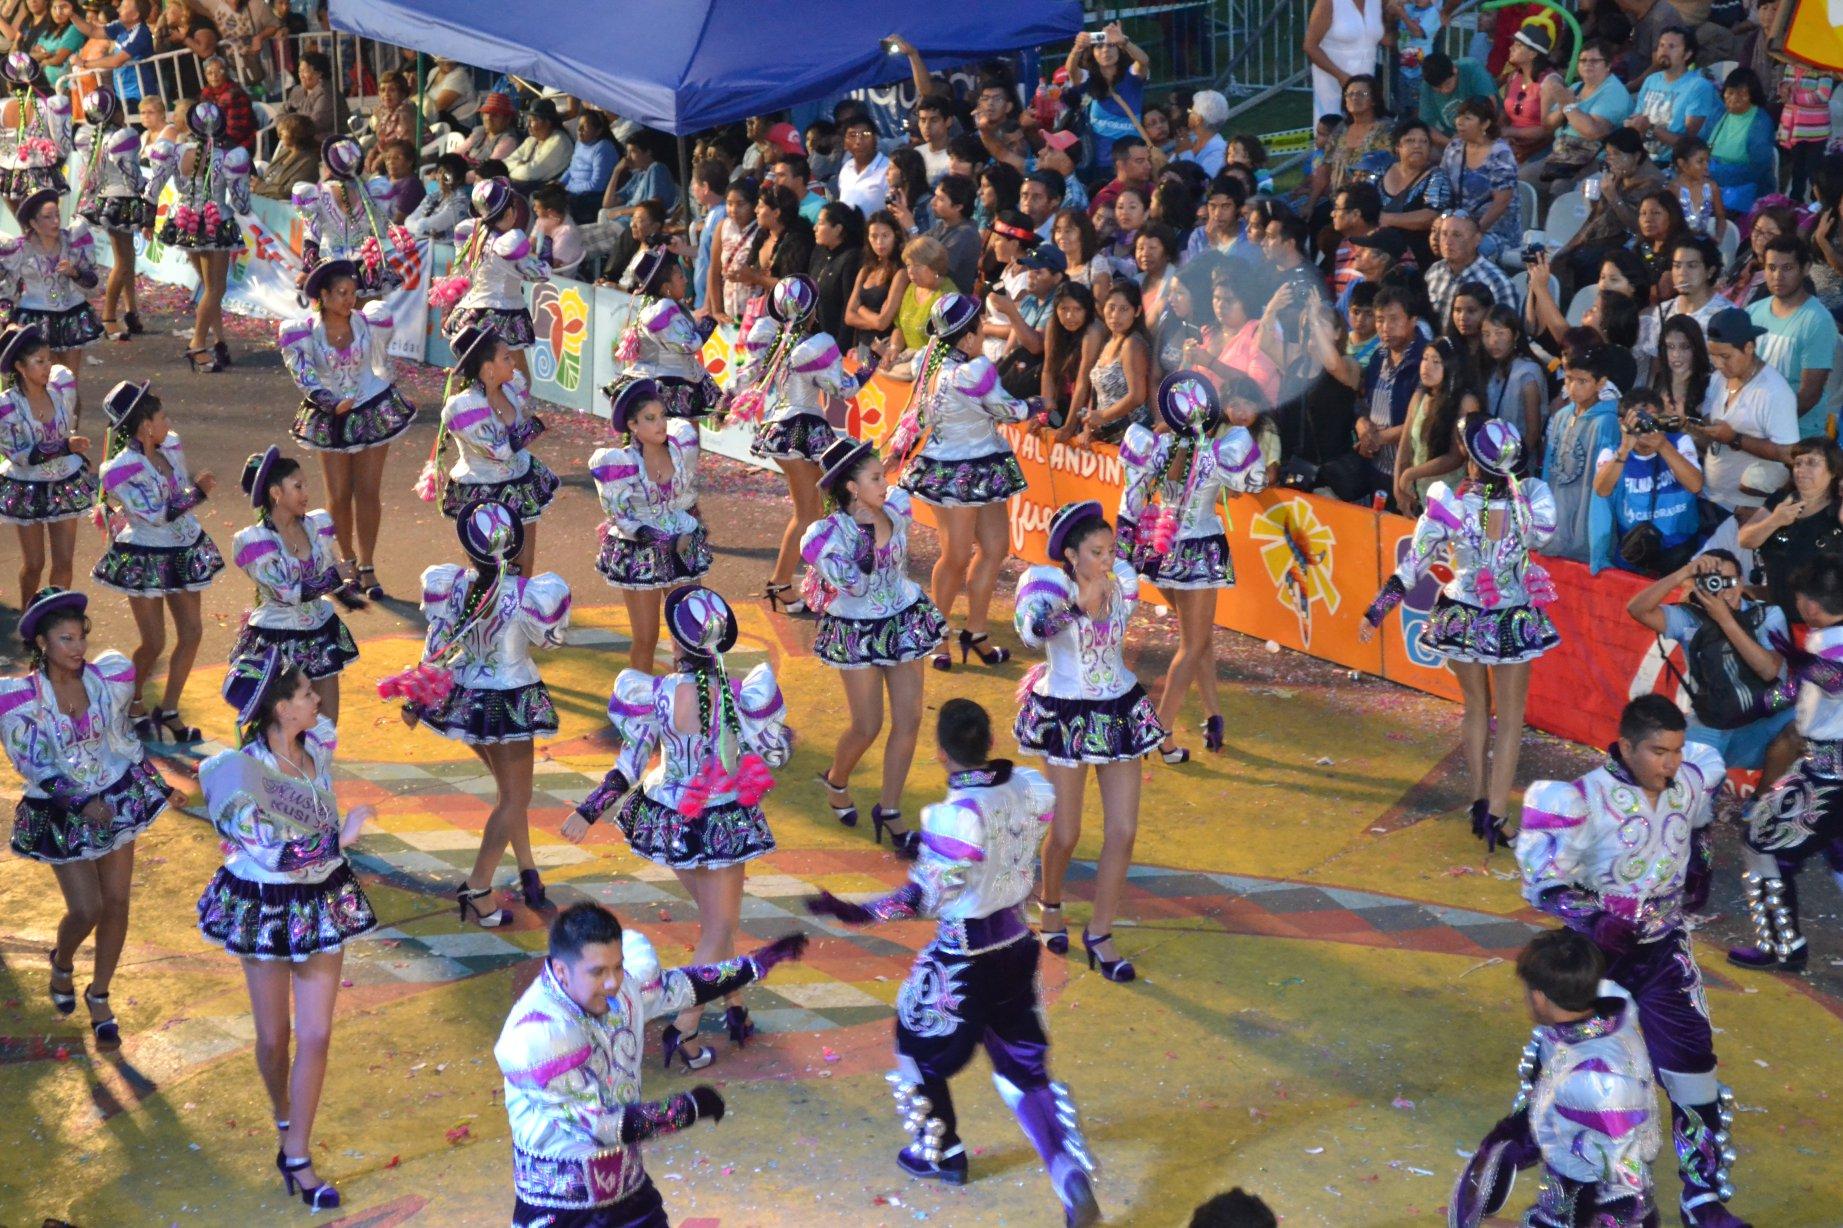 Positivo Balance deja El Carnaval Andino 2015